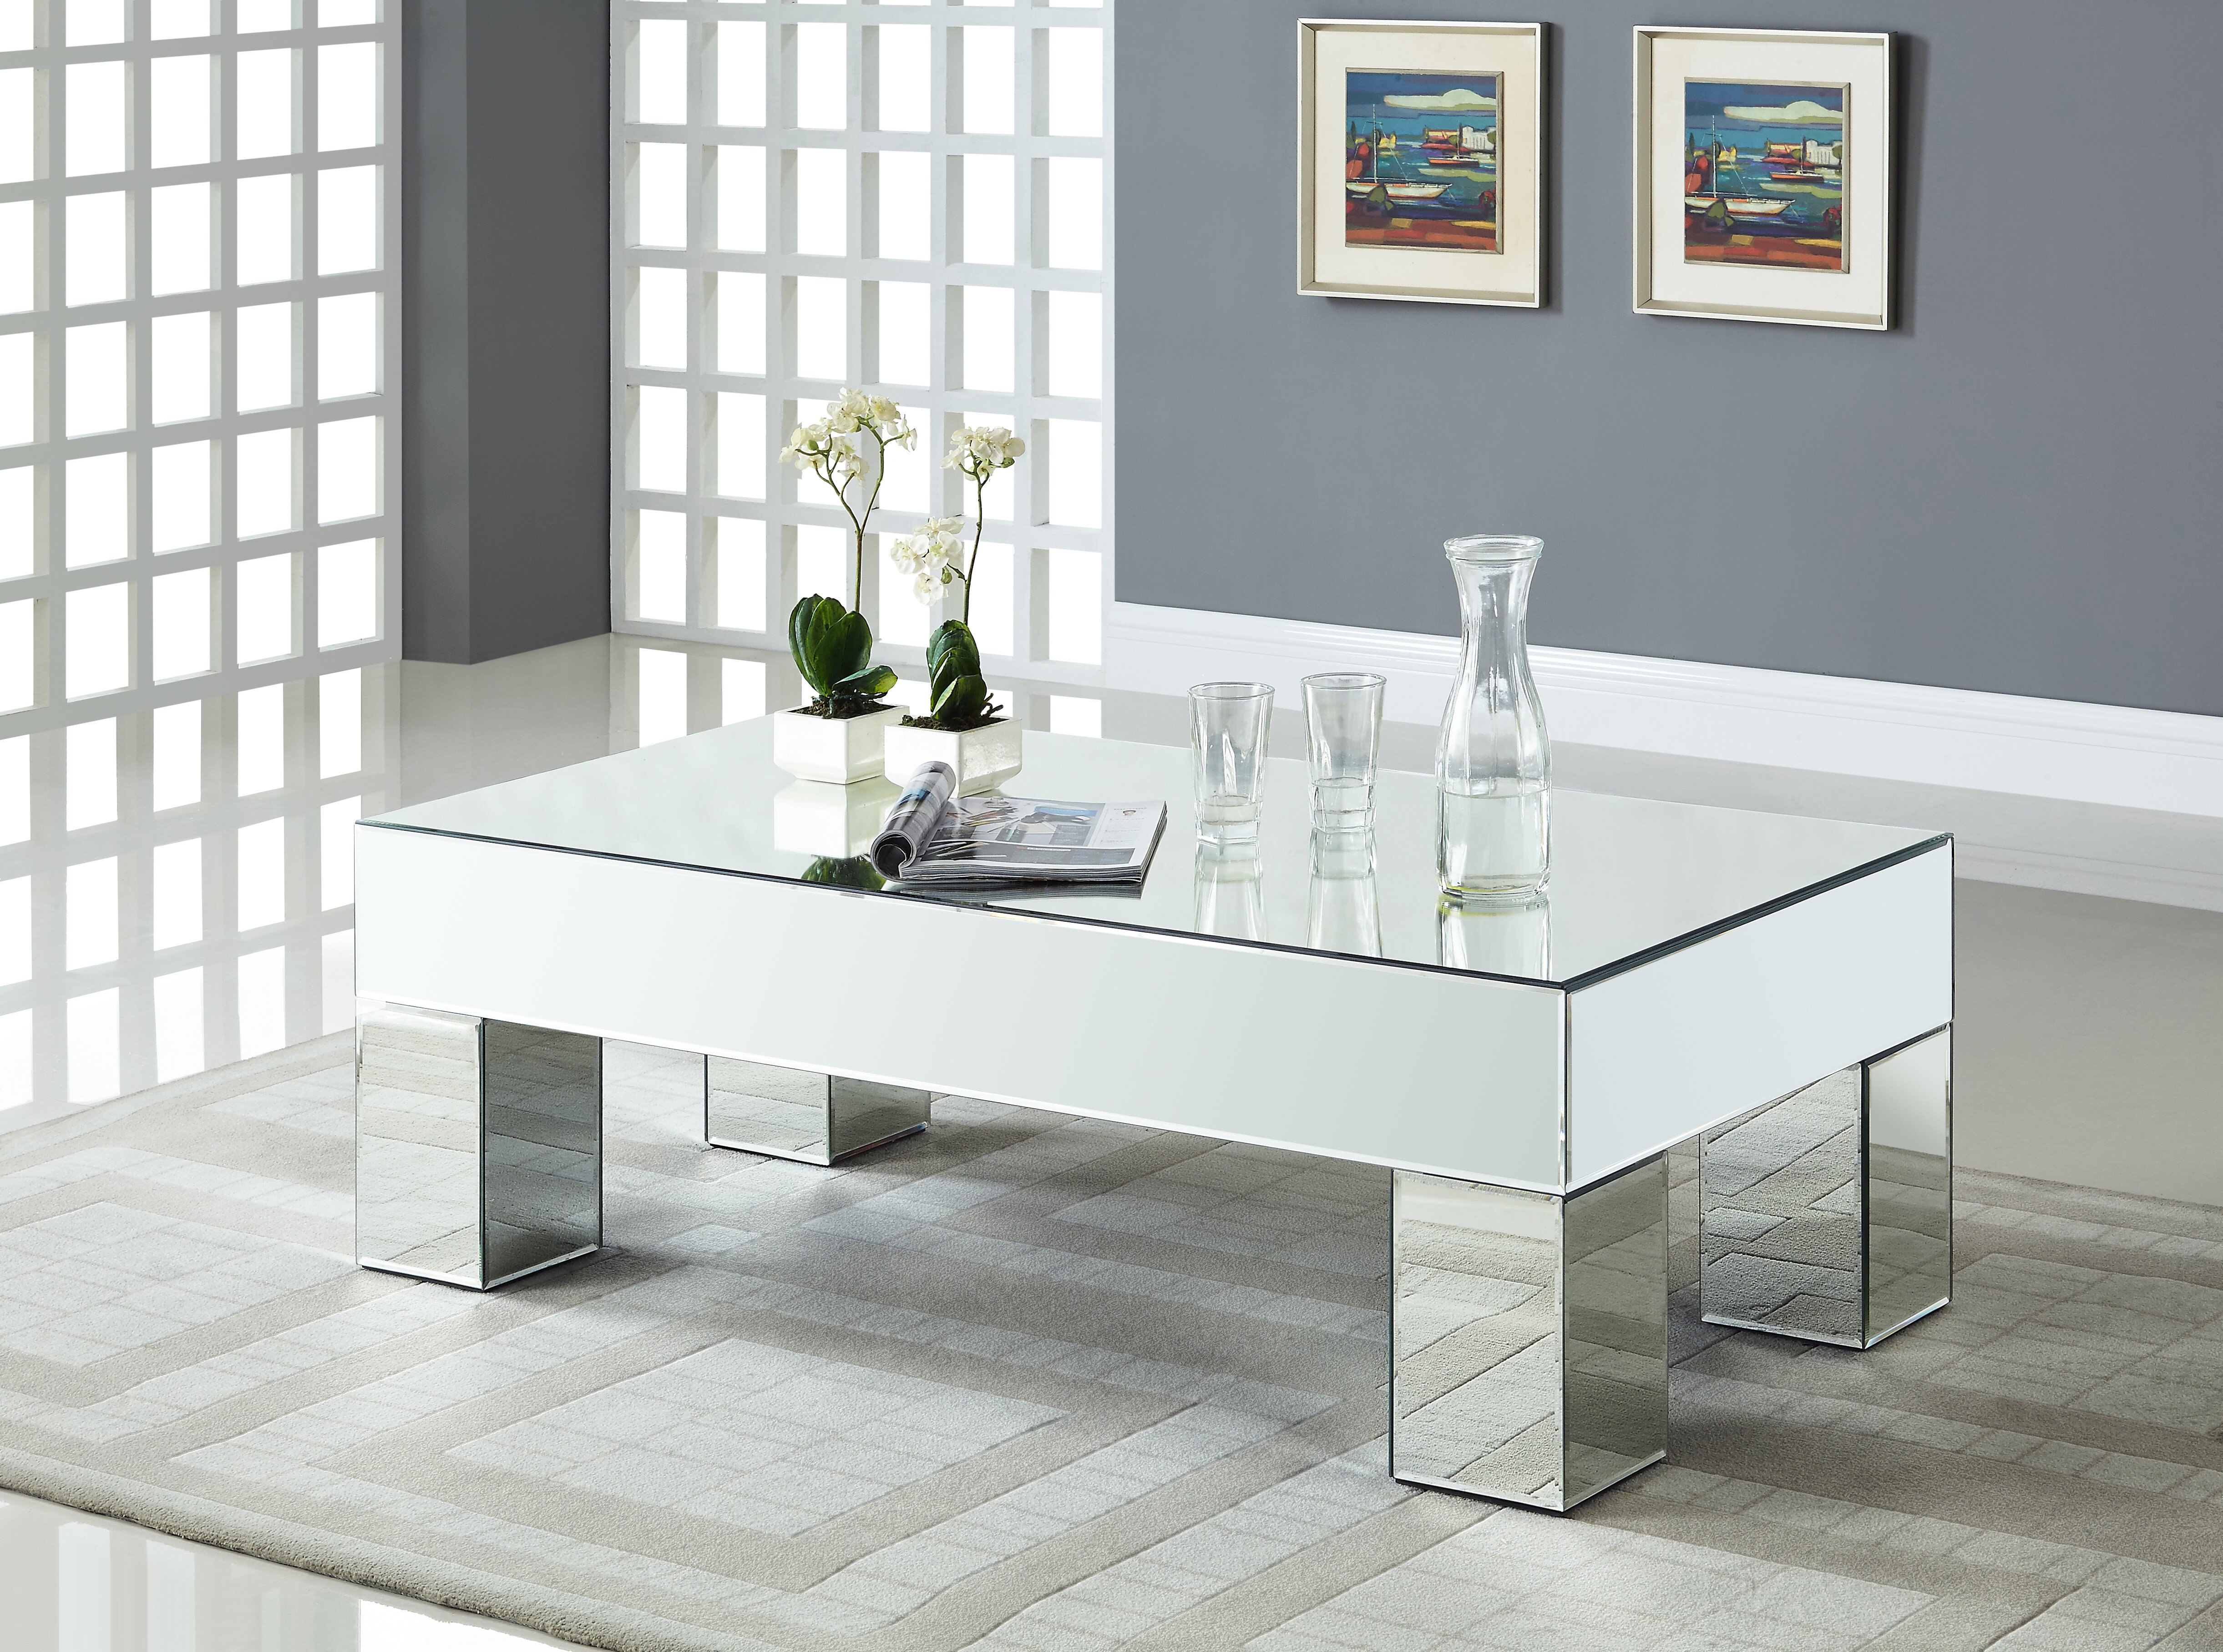 House of Hampton Nevels Mirrored Coffee Table & Reviews | Wayfair